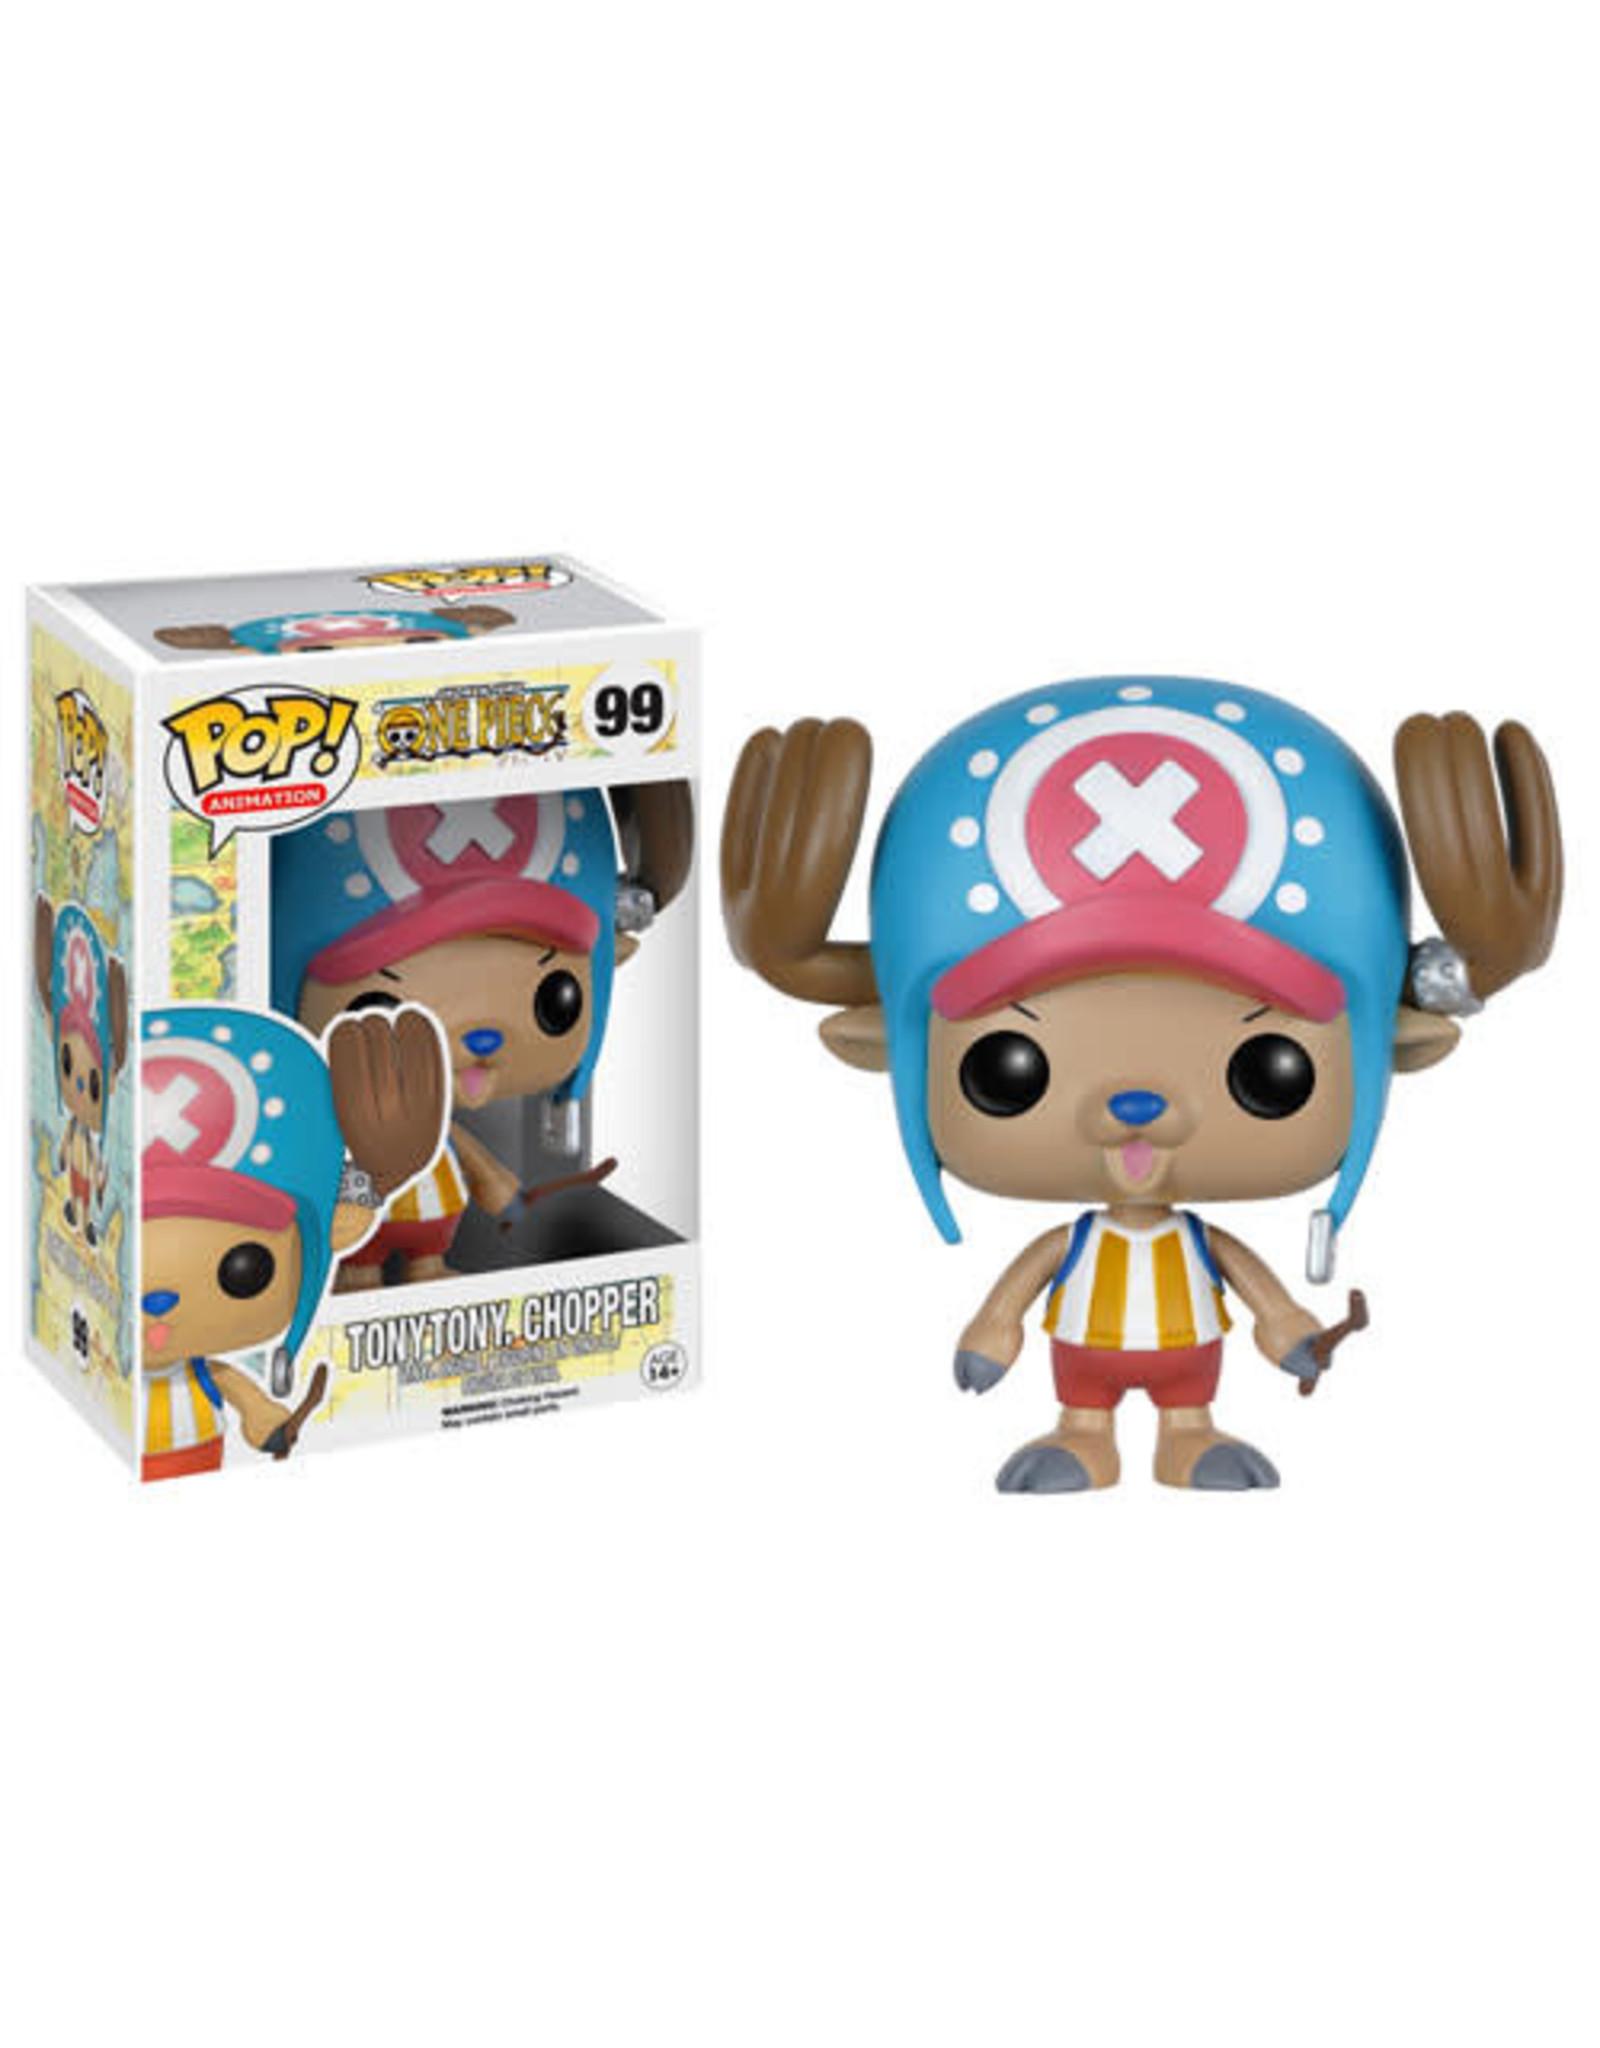 One Piece - Tonytony Chopper - Funko Pop! Animation 99